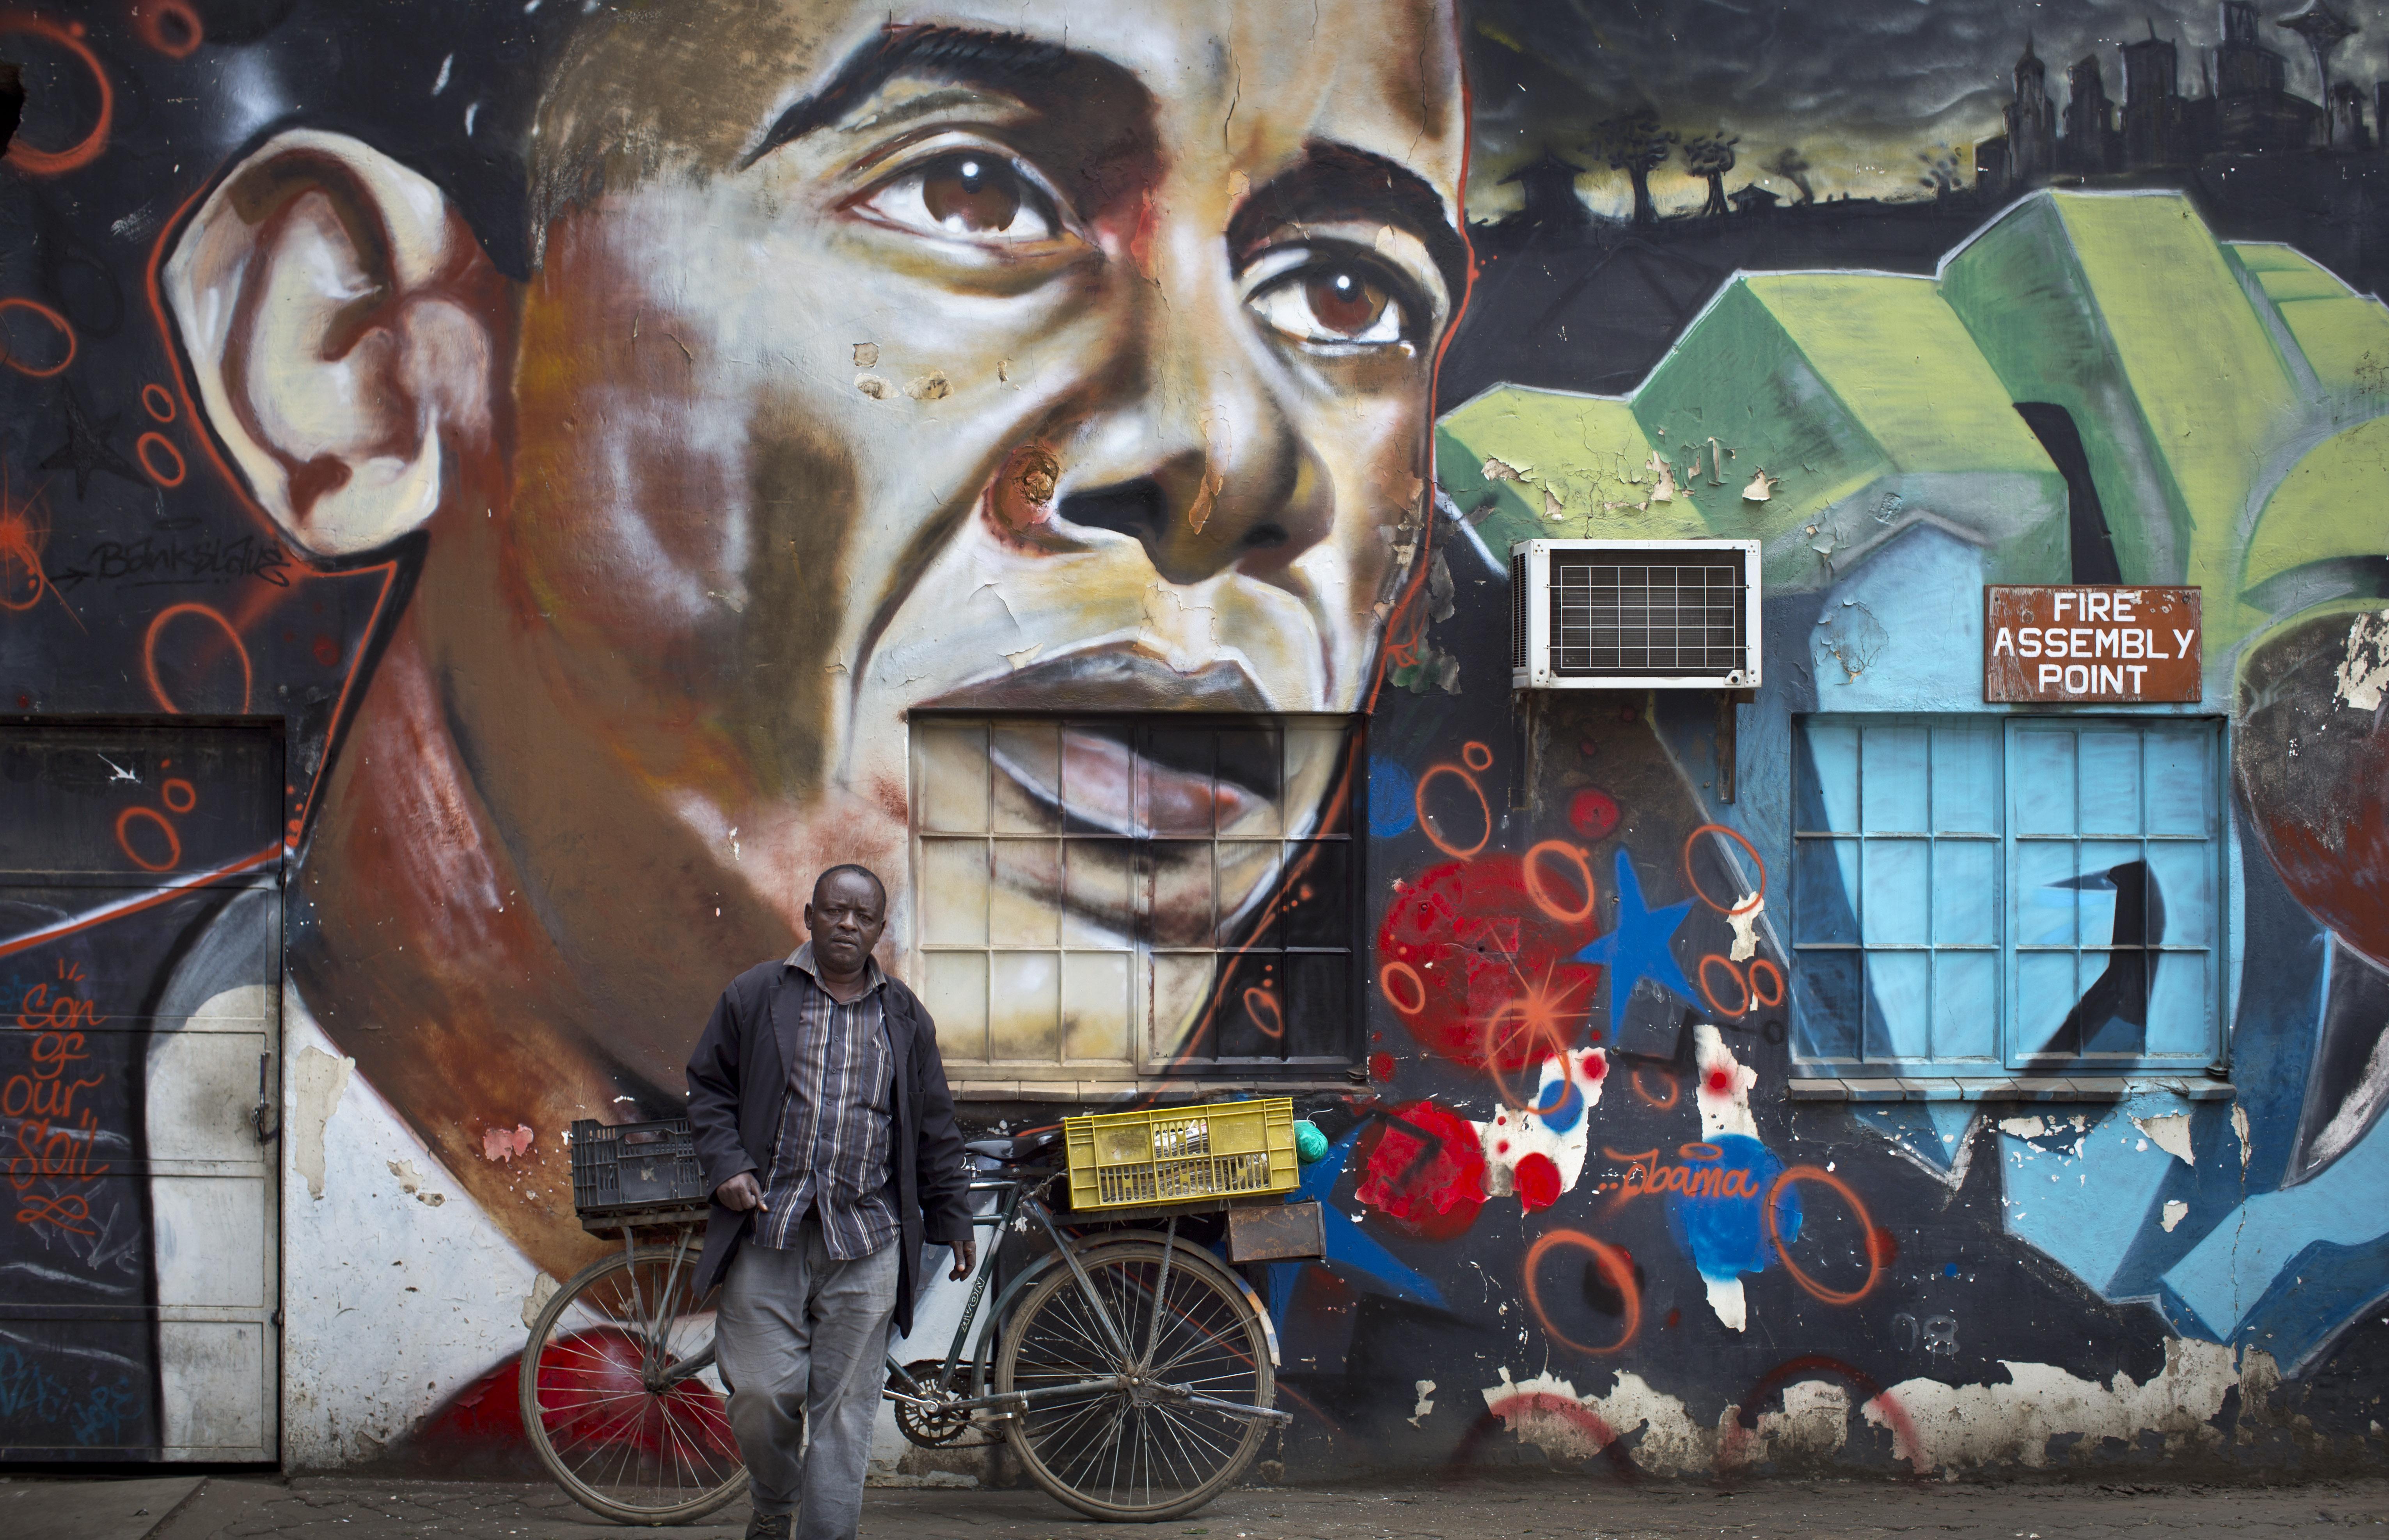 A mural of President Barack Obama at the GoDown Arts Centre in Nairobi, Kenya